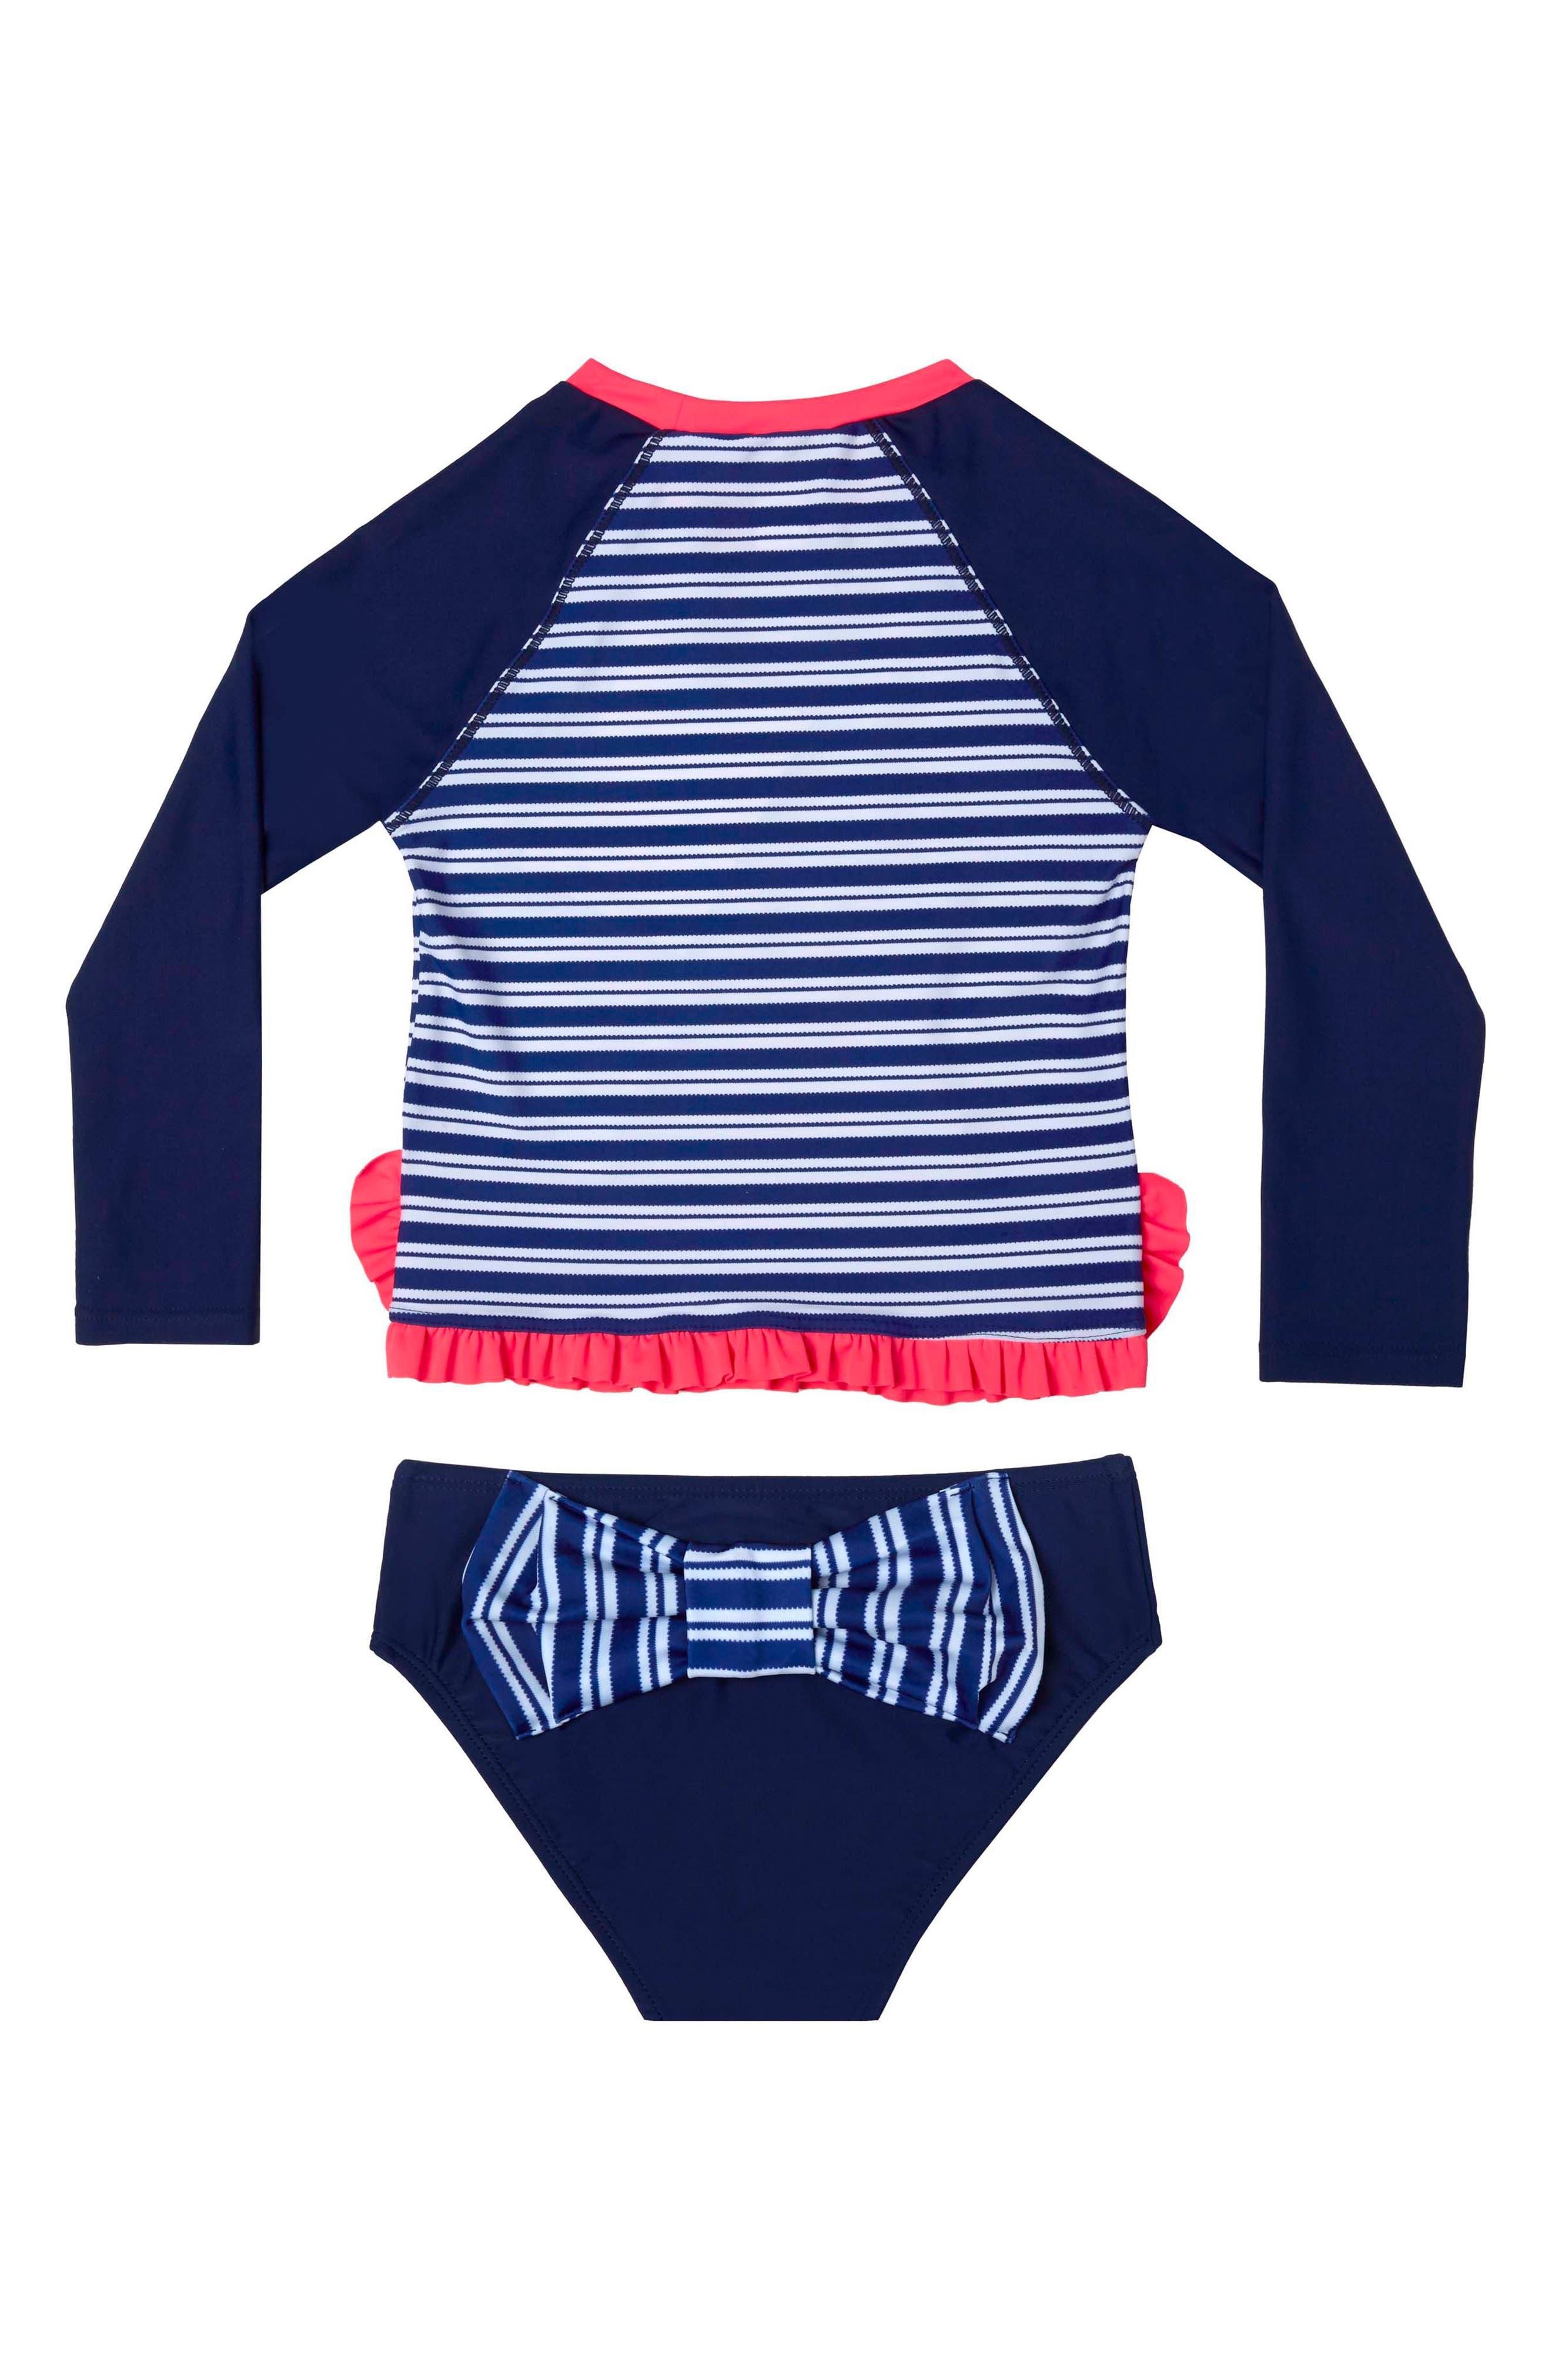 Retro Stripe Two-Piece Rashguard Swimsuit,                             Main thumbnail 1, color,                             406